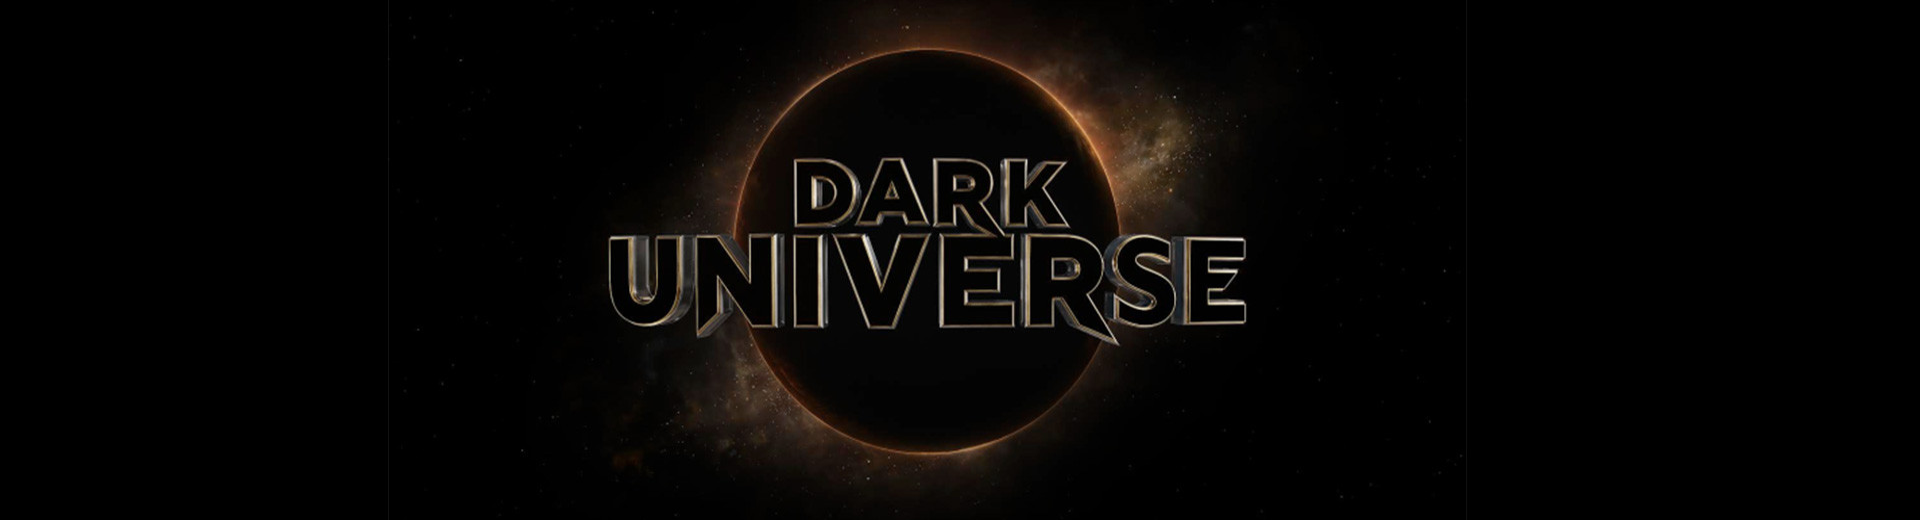 dark-universe-header.jpg